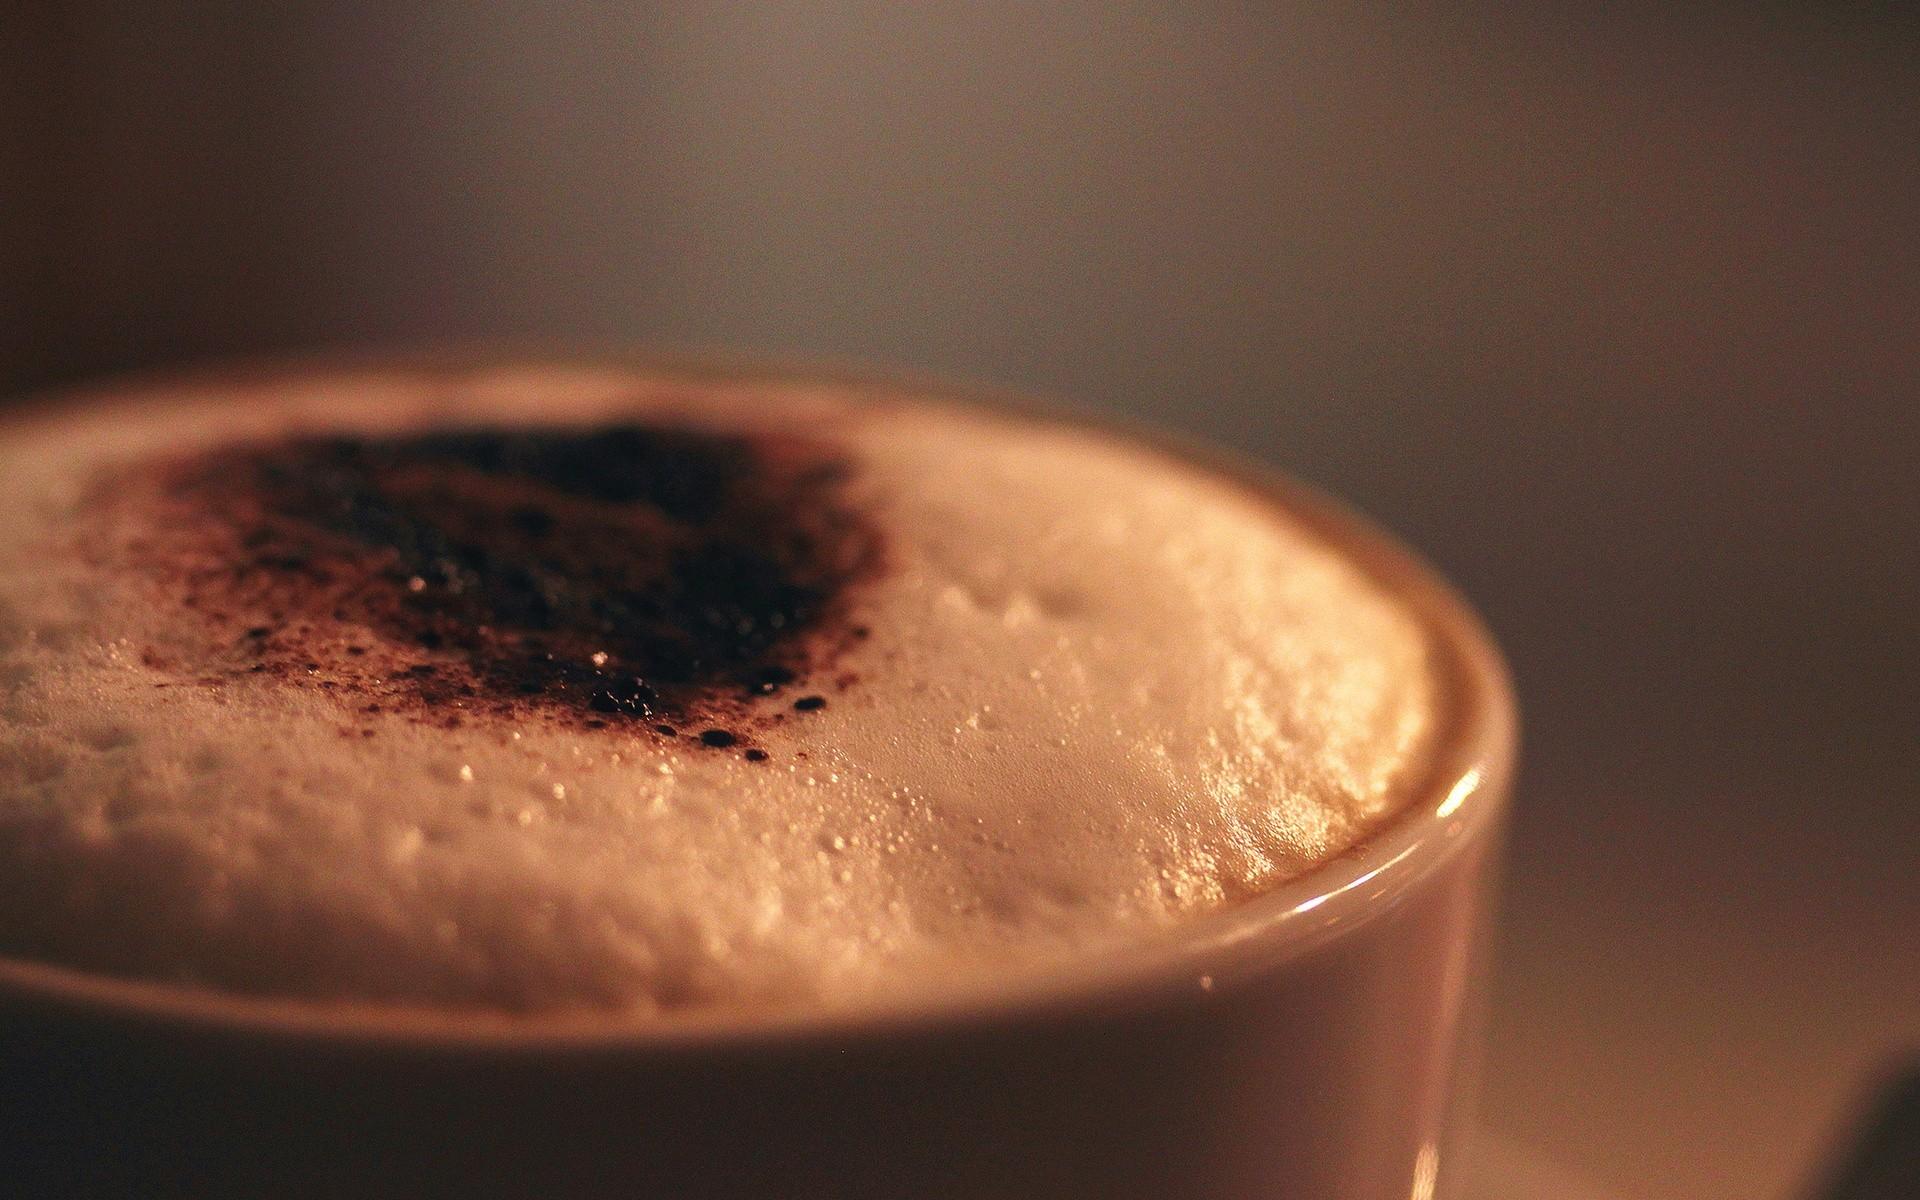 более, картинки и обои утро кофе диваны